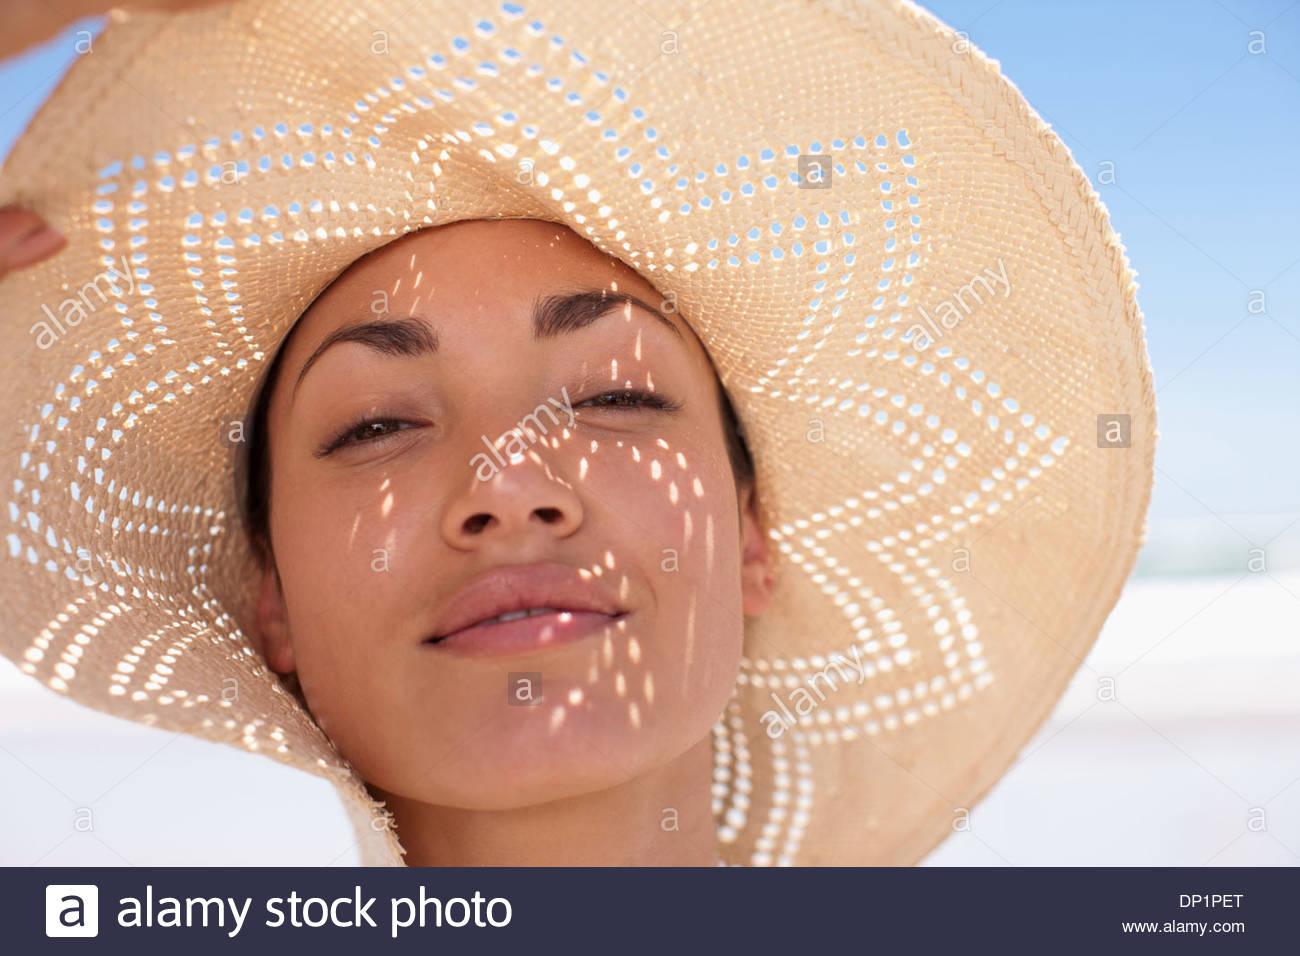 Woman wearing sun hat on beach Photo Stock